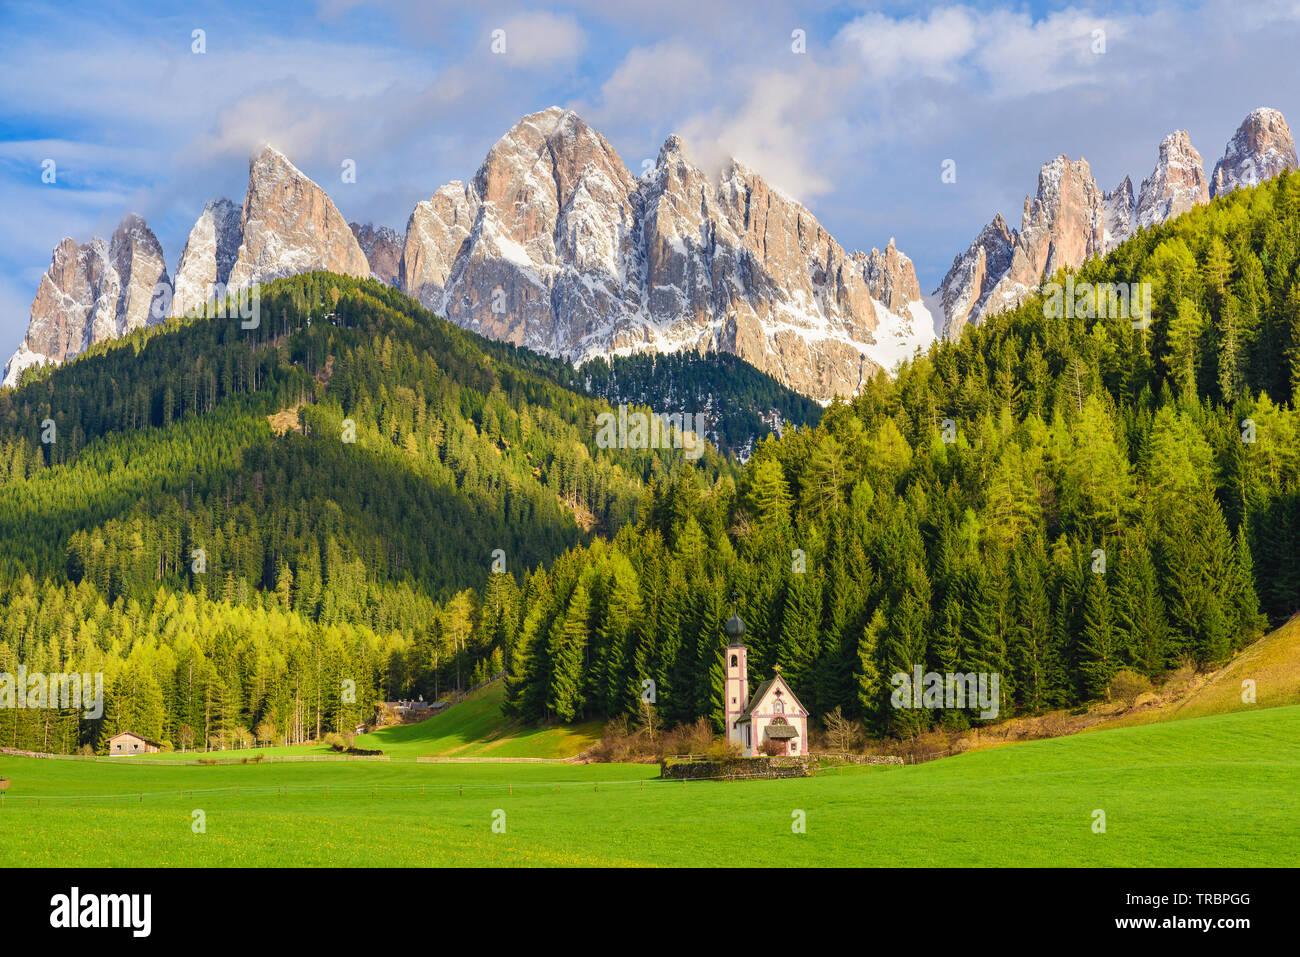 Sunny landscape of Dolomite Alps. St Johann Church with beautiful Dolomiti mountains, Santa Maddalena, Val Di Funes, Dolomites, Italy. - Stock Image